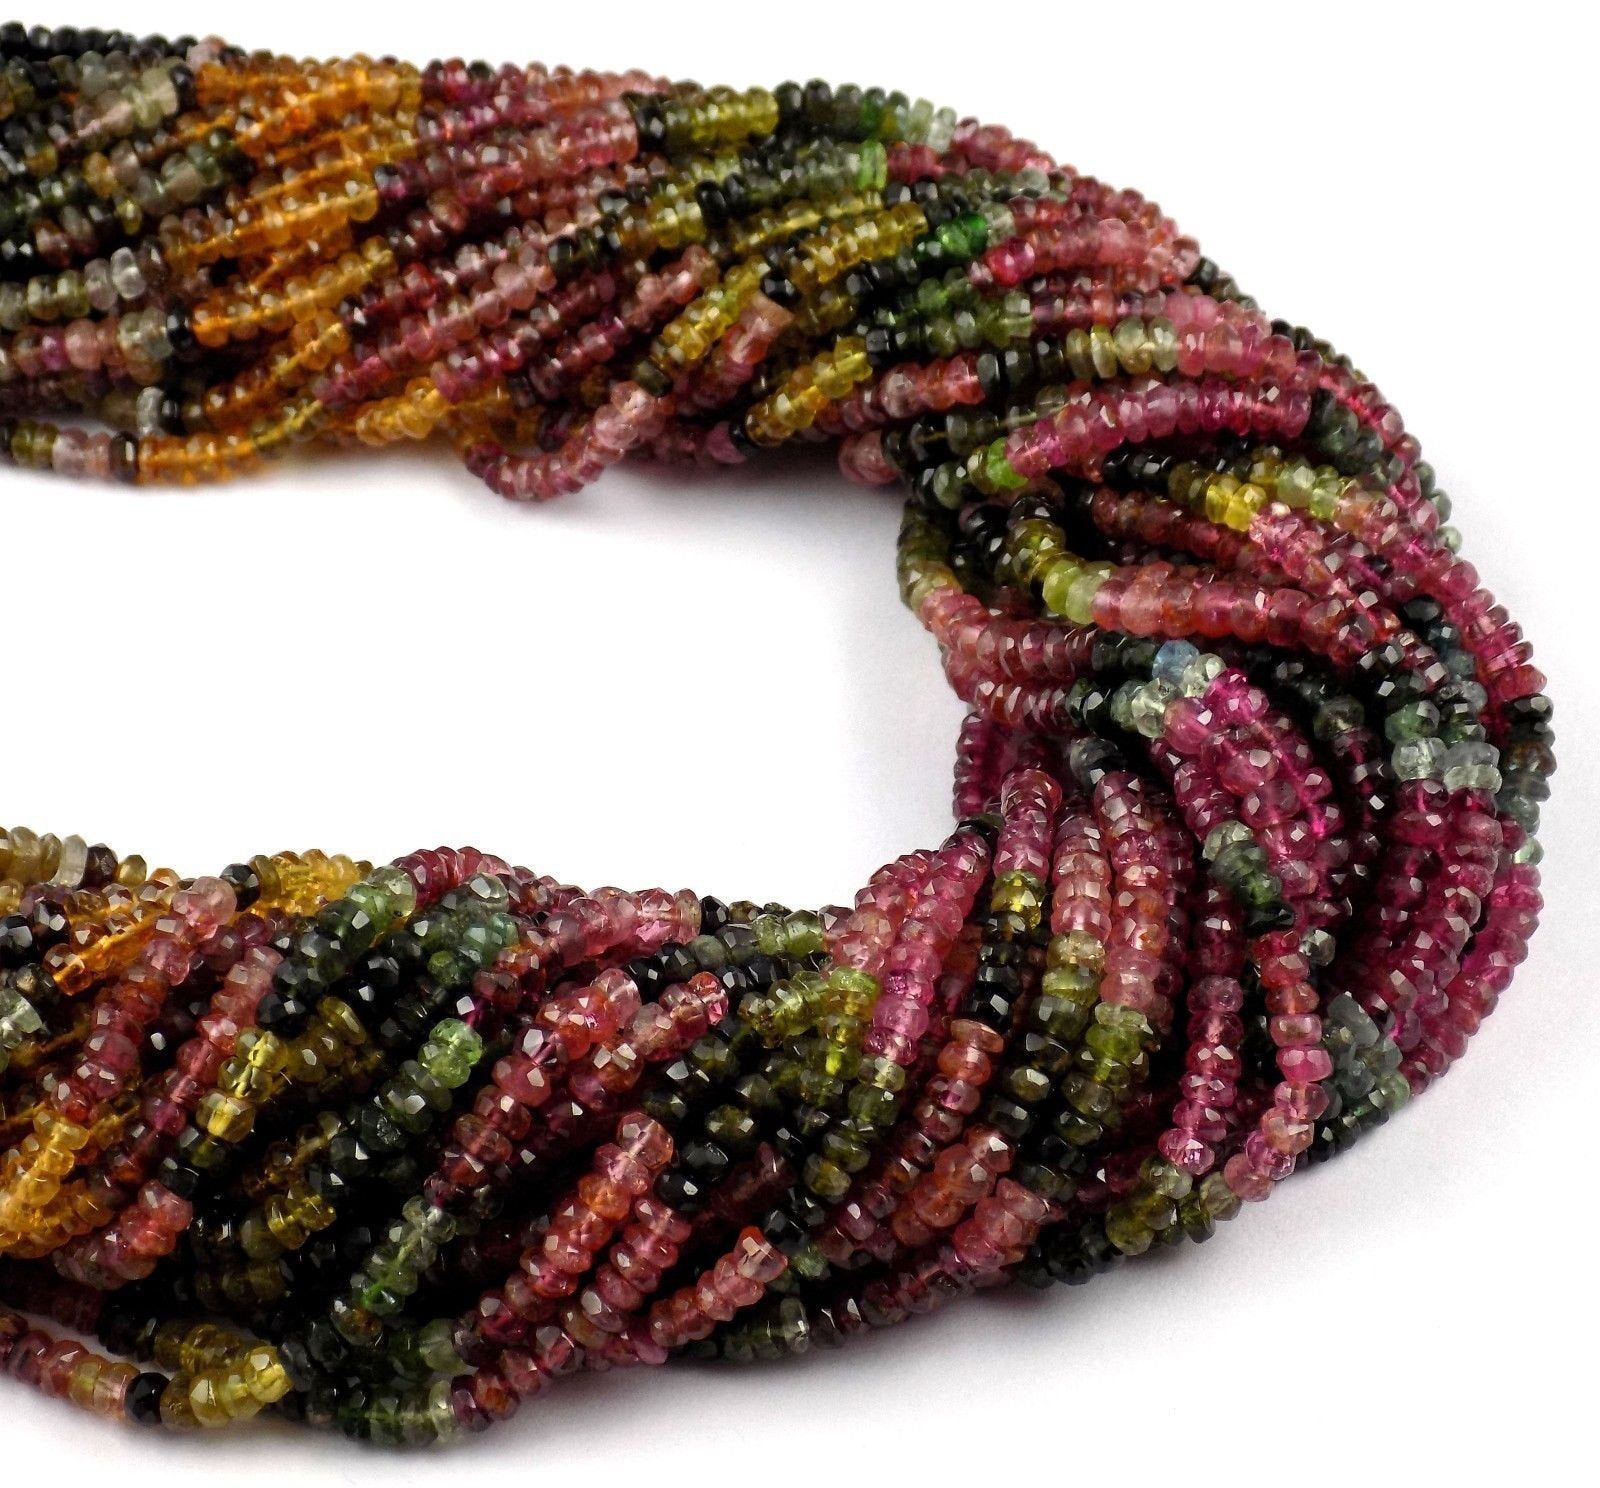 Tourmaline Rondelle Beads For Jewelry 13 Strand Natural Multi Tourmaline Faceted Rondelle Beads 3.5-4mm Multi Tourmaline Micro Cut Beads